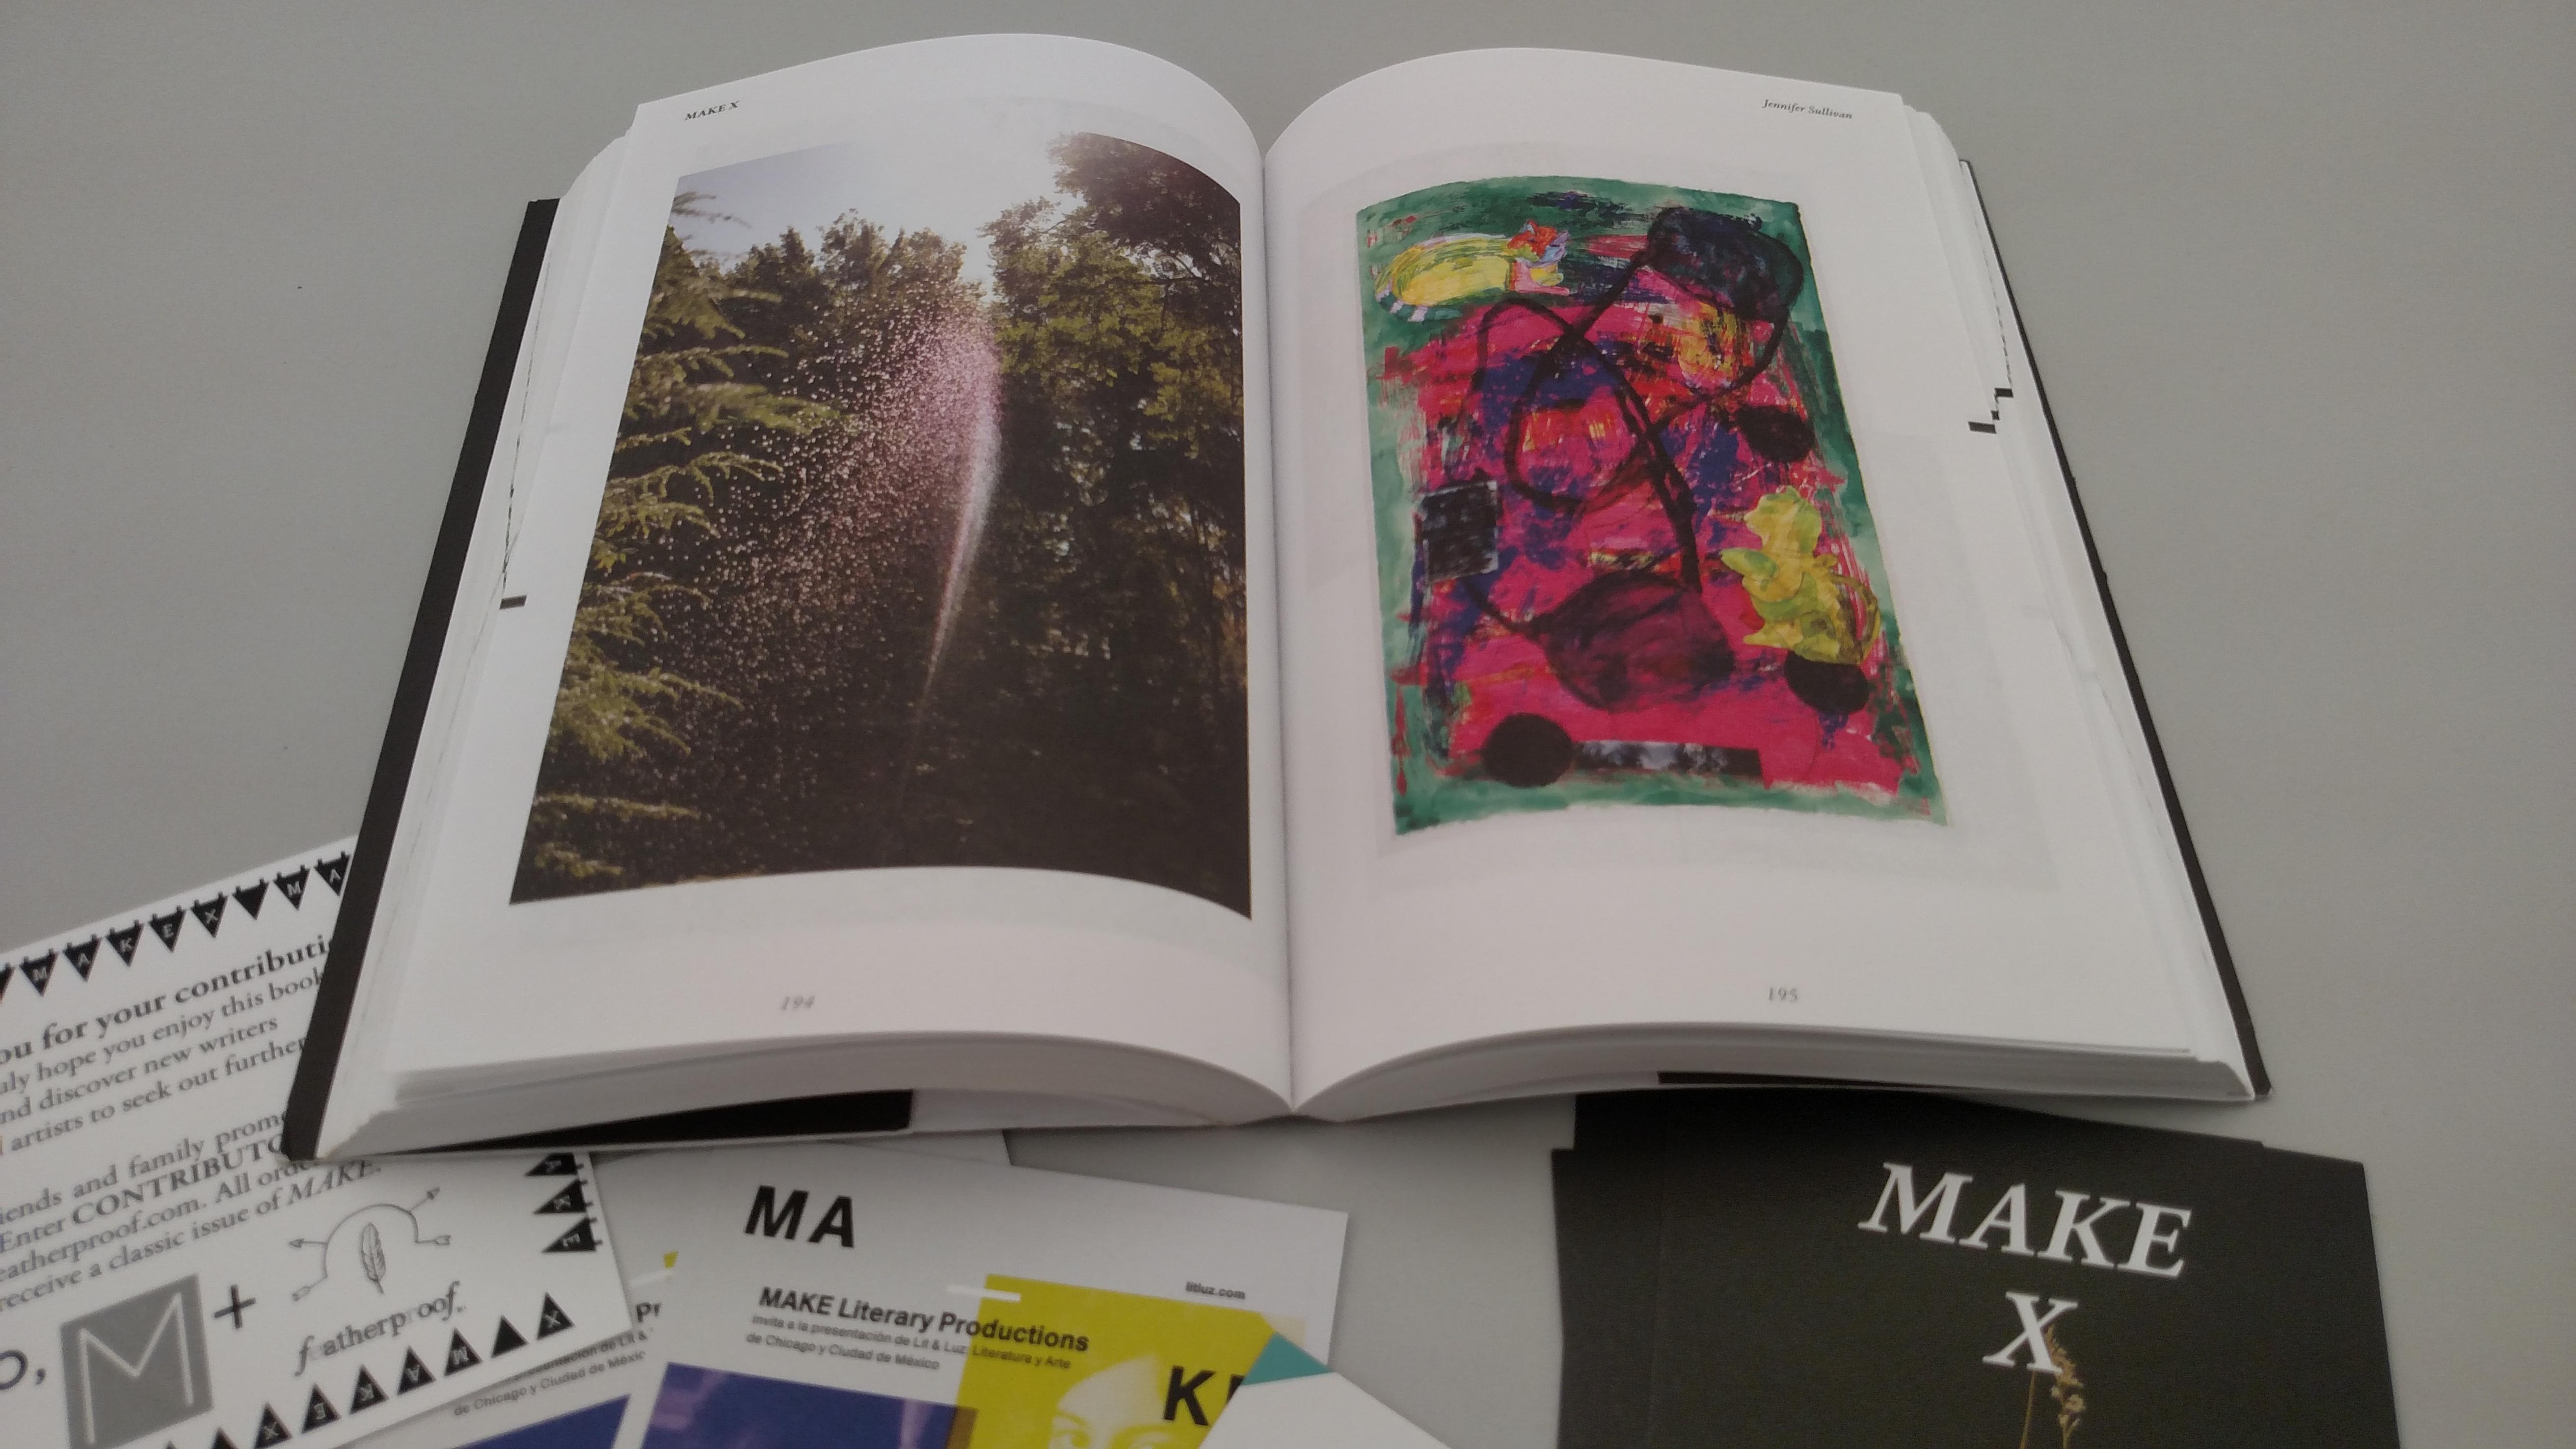 A selection of MAKE Literary Magazine's ephemera for the archive. Image credit: Jennifer Patiño Cervantes.